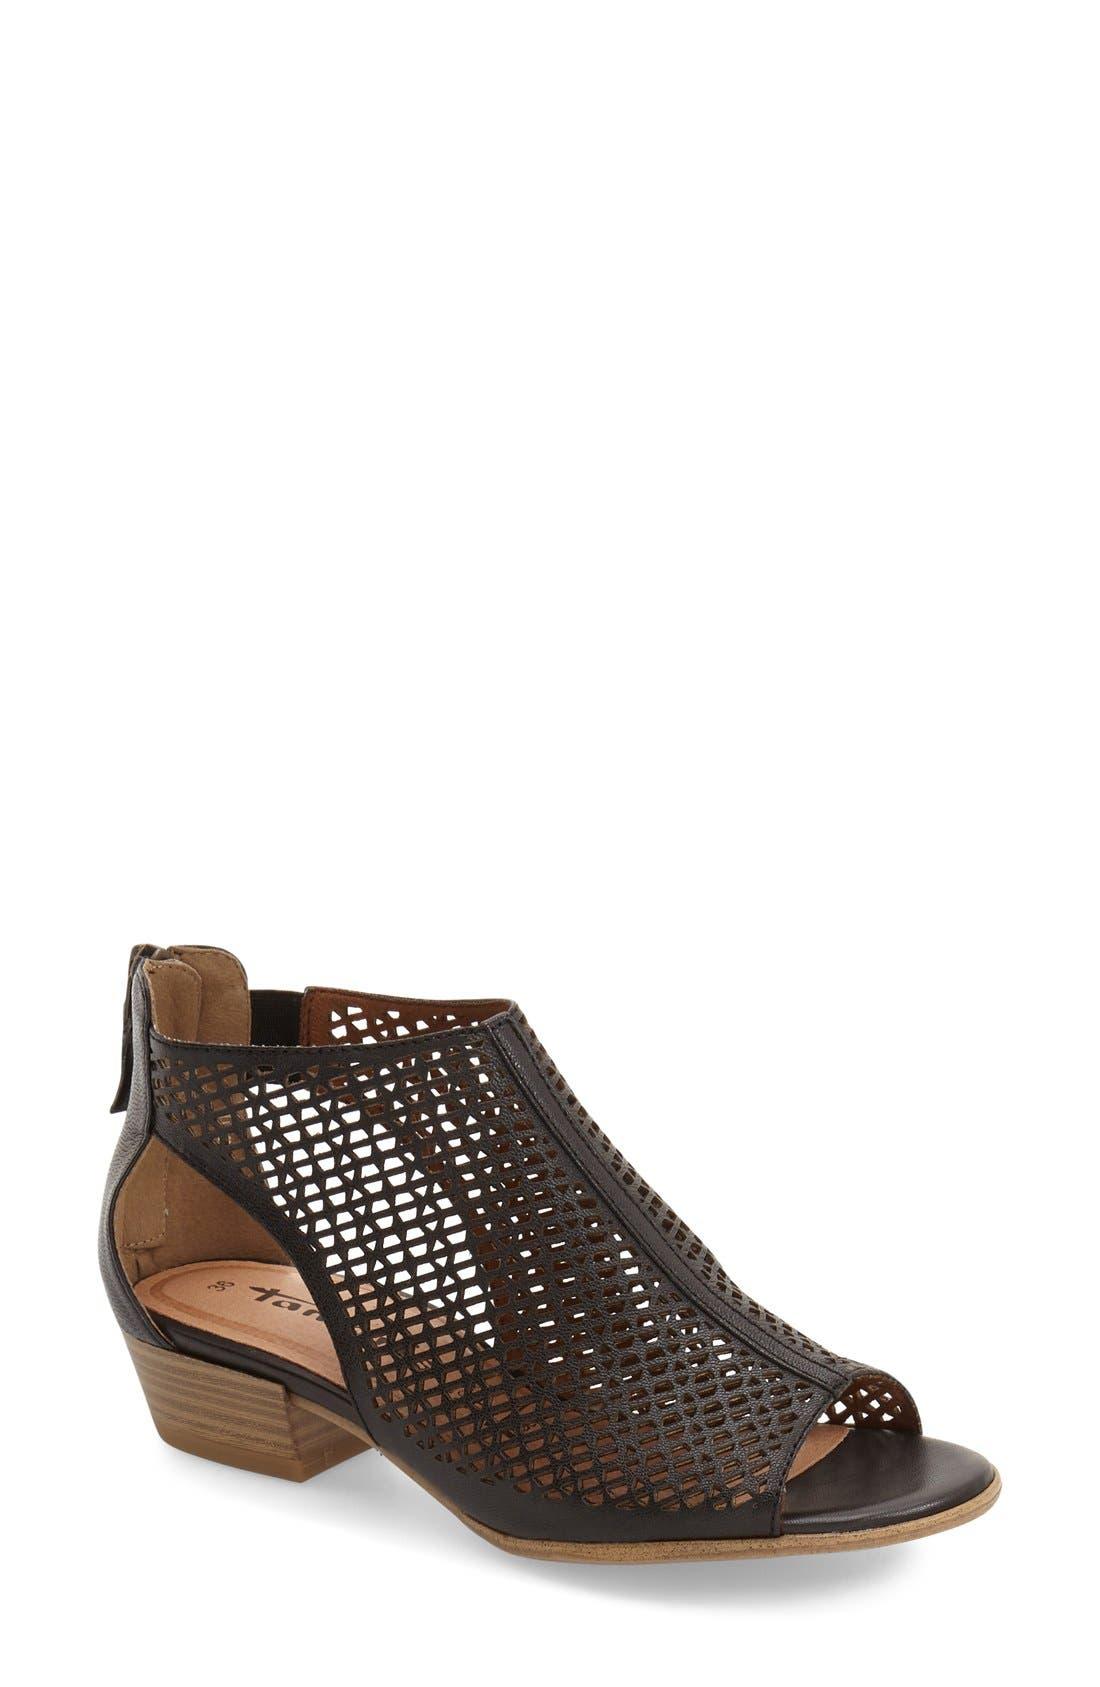 'Nao' Open Toe Sandal,                         Main,                         color, Black Leather